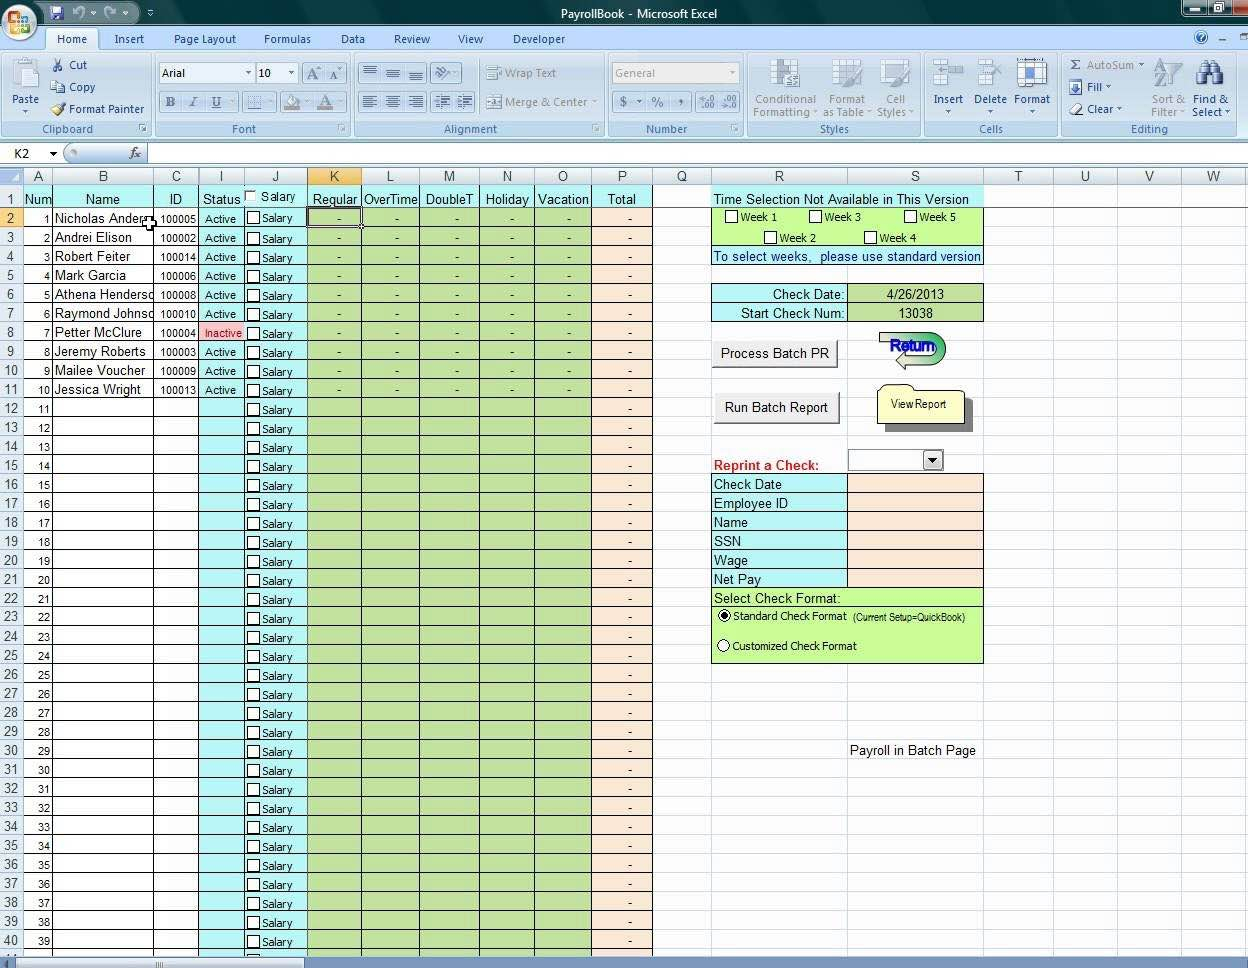 Payroll Spreadsheet Australia Regarding Payroll Spreadsheet Template Australia And How To Create Payroll In